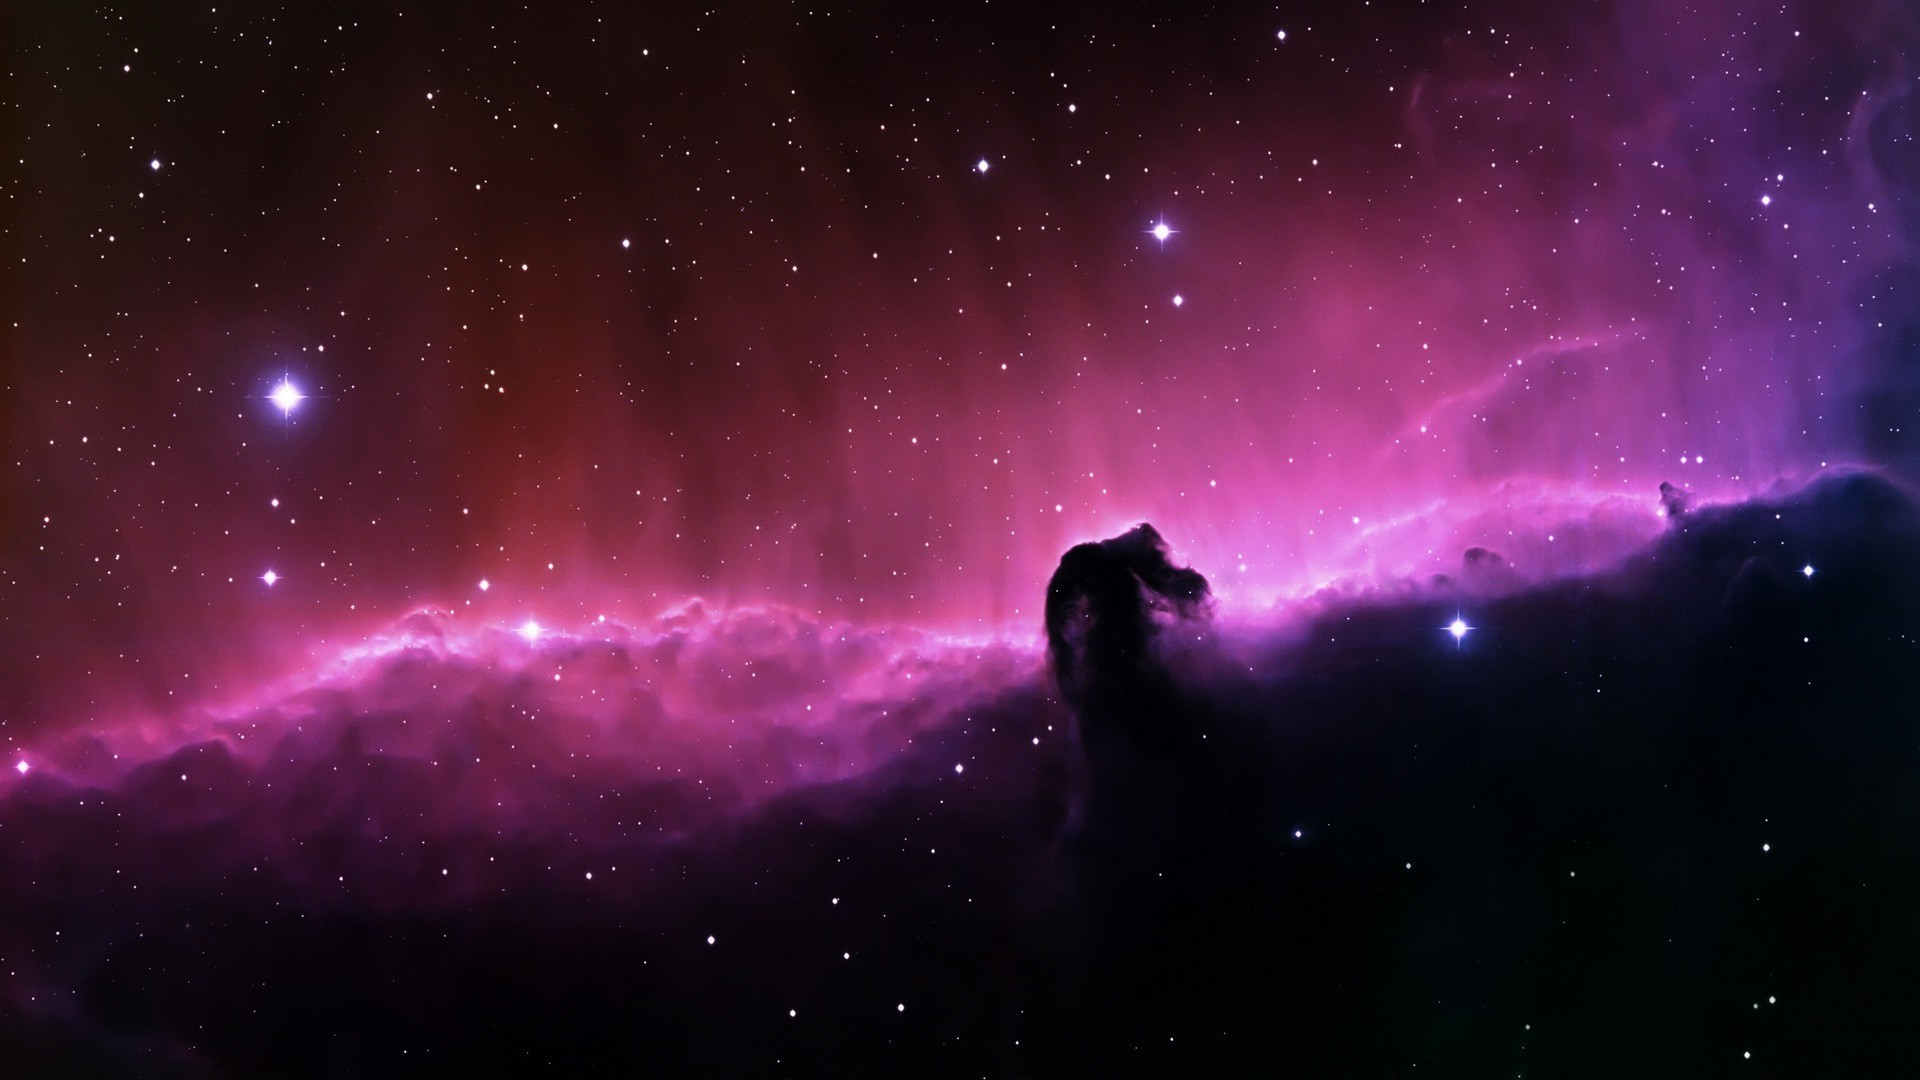 … e horsehead nebula wallpapers hd desktop and mobile backgrounds …